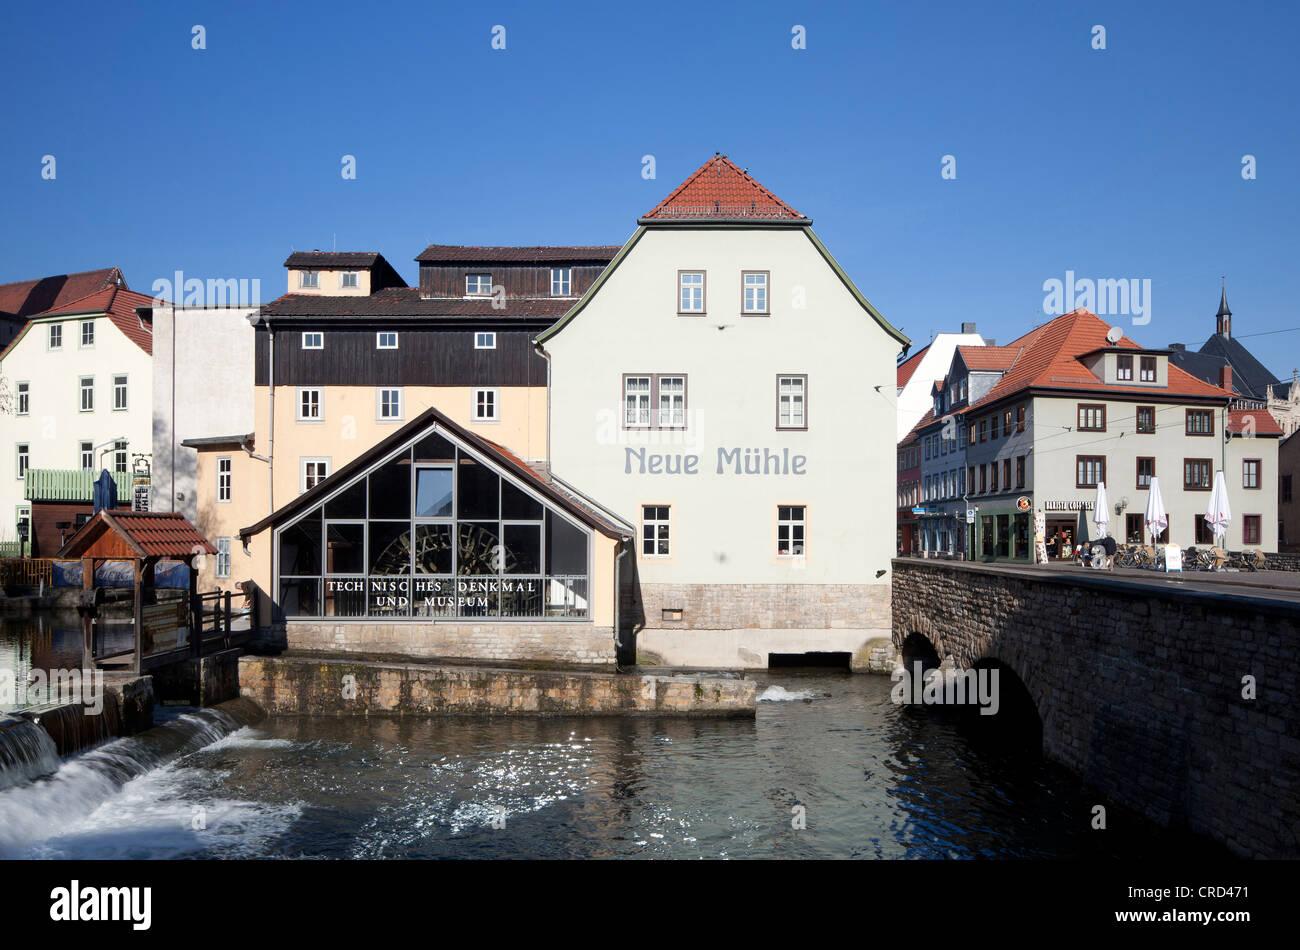 Neue Muehle, mill museum, technical monument, Erfurt, Thuringia, Germany, Europe, PublicGround - Stock Image